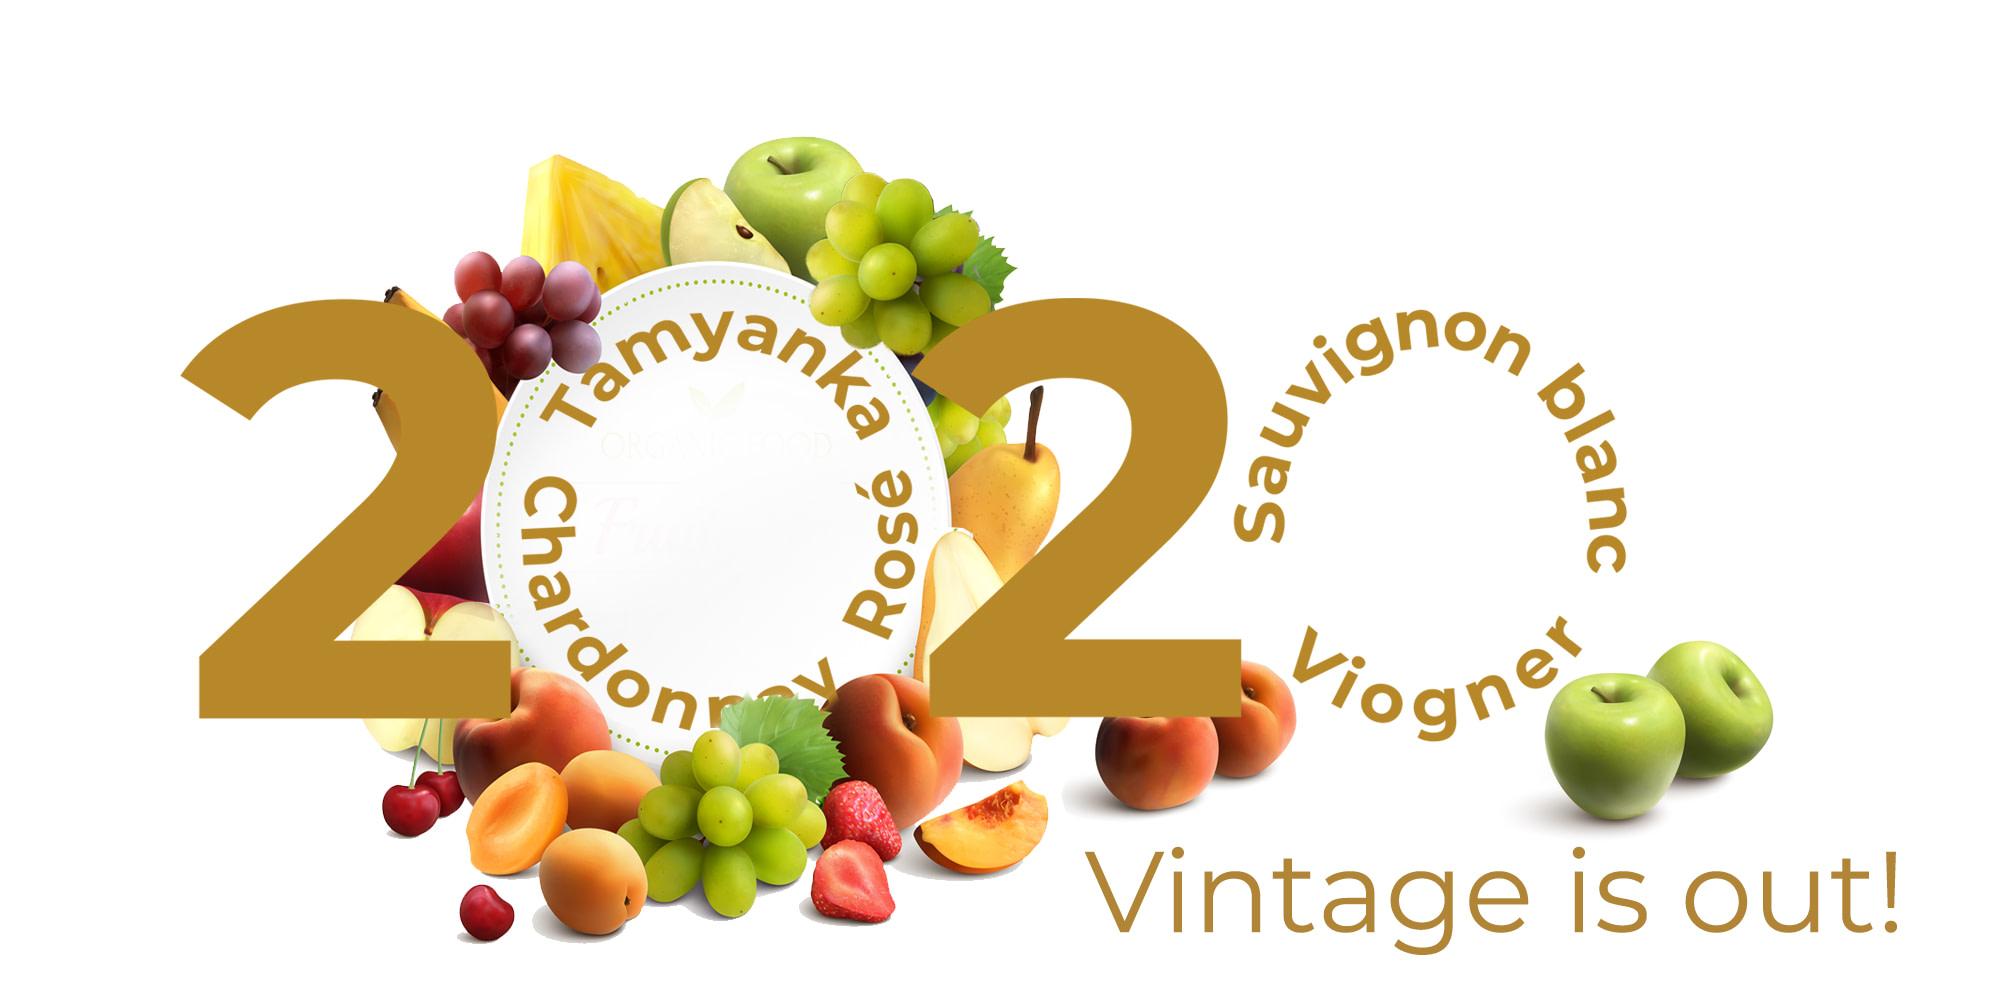 Vintage 2020